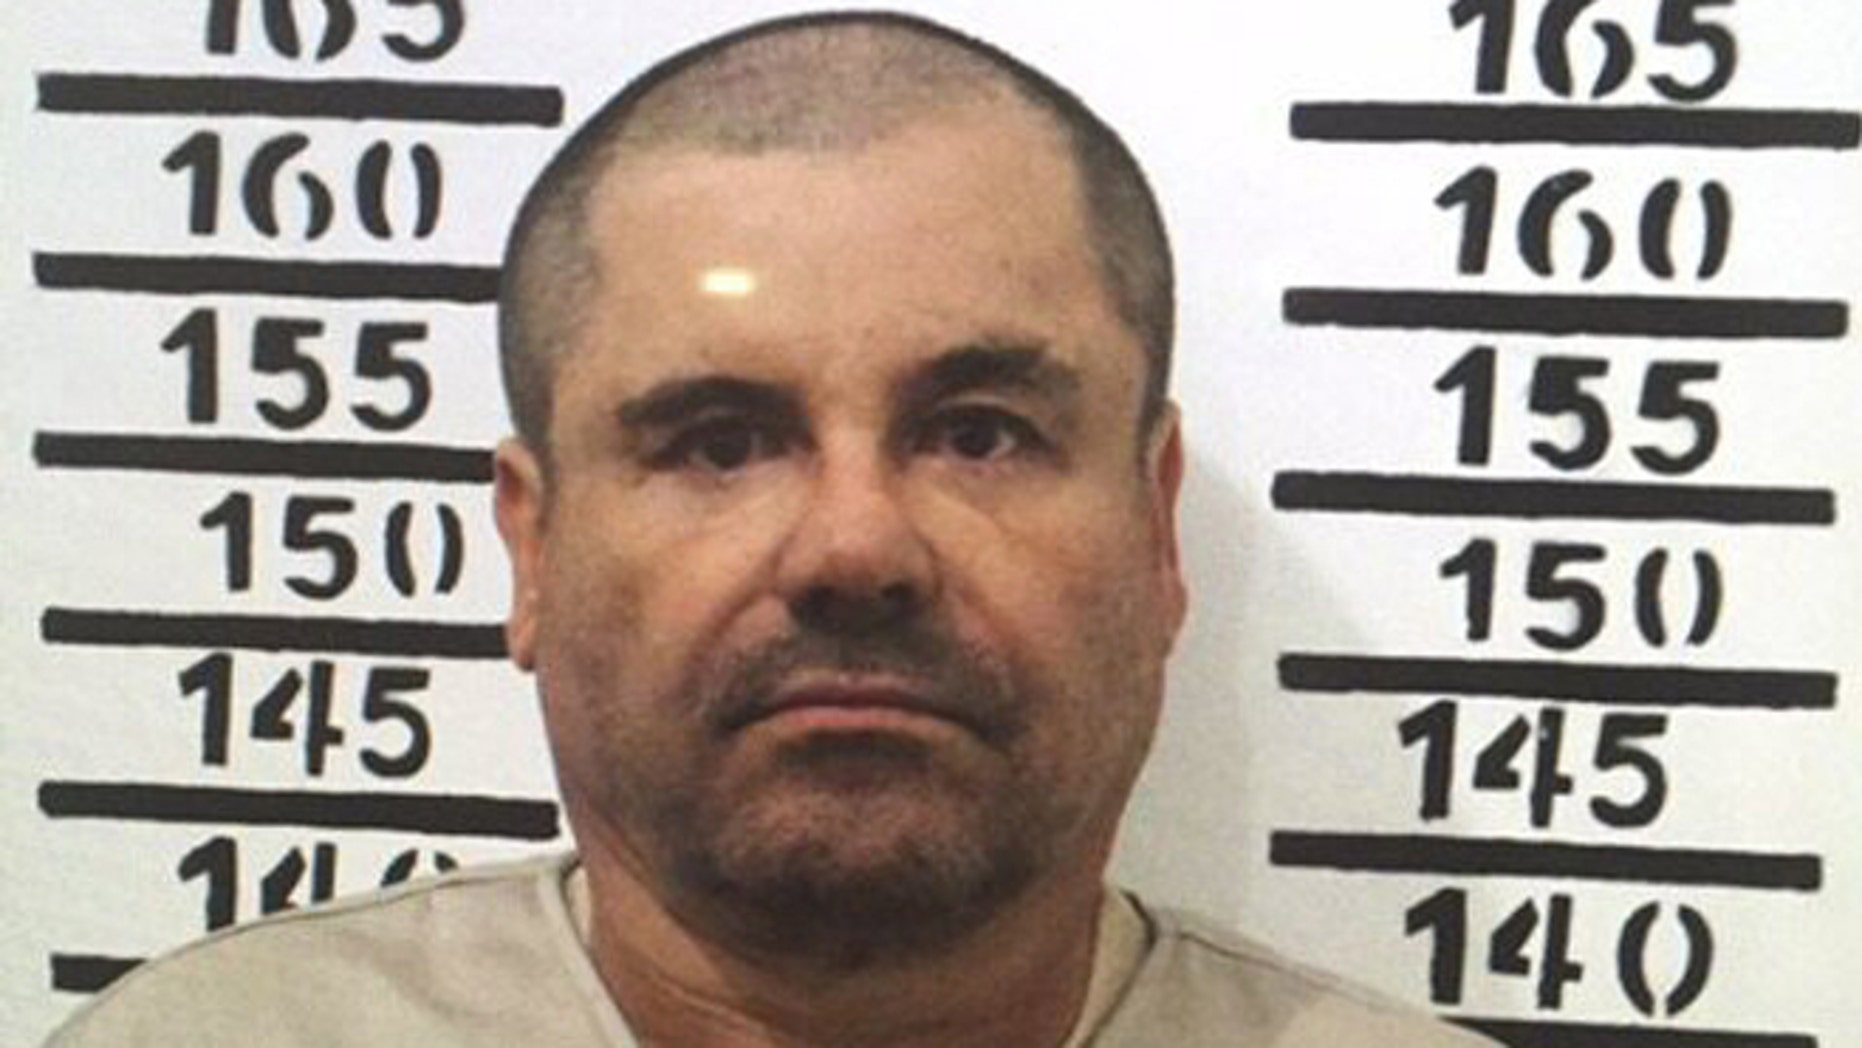 Joaquin 'El Chapo' Guzman in a Jan. 8, 2016 image released by Mexico's federal government.